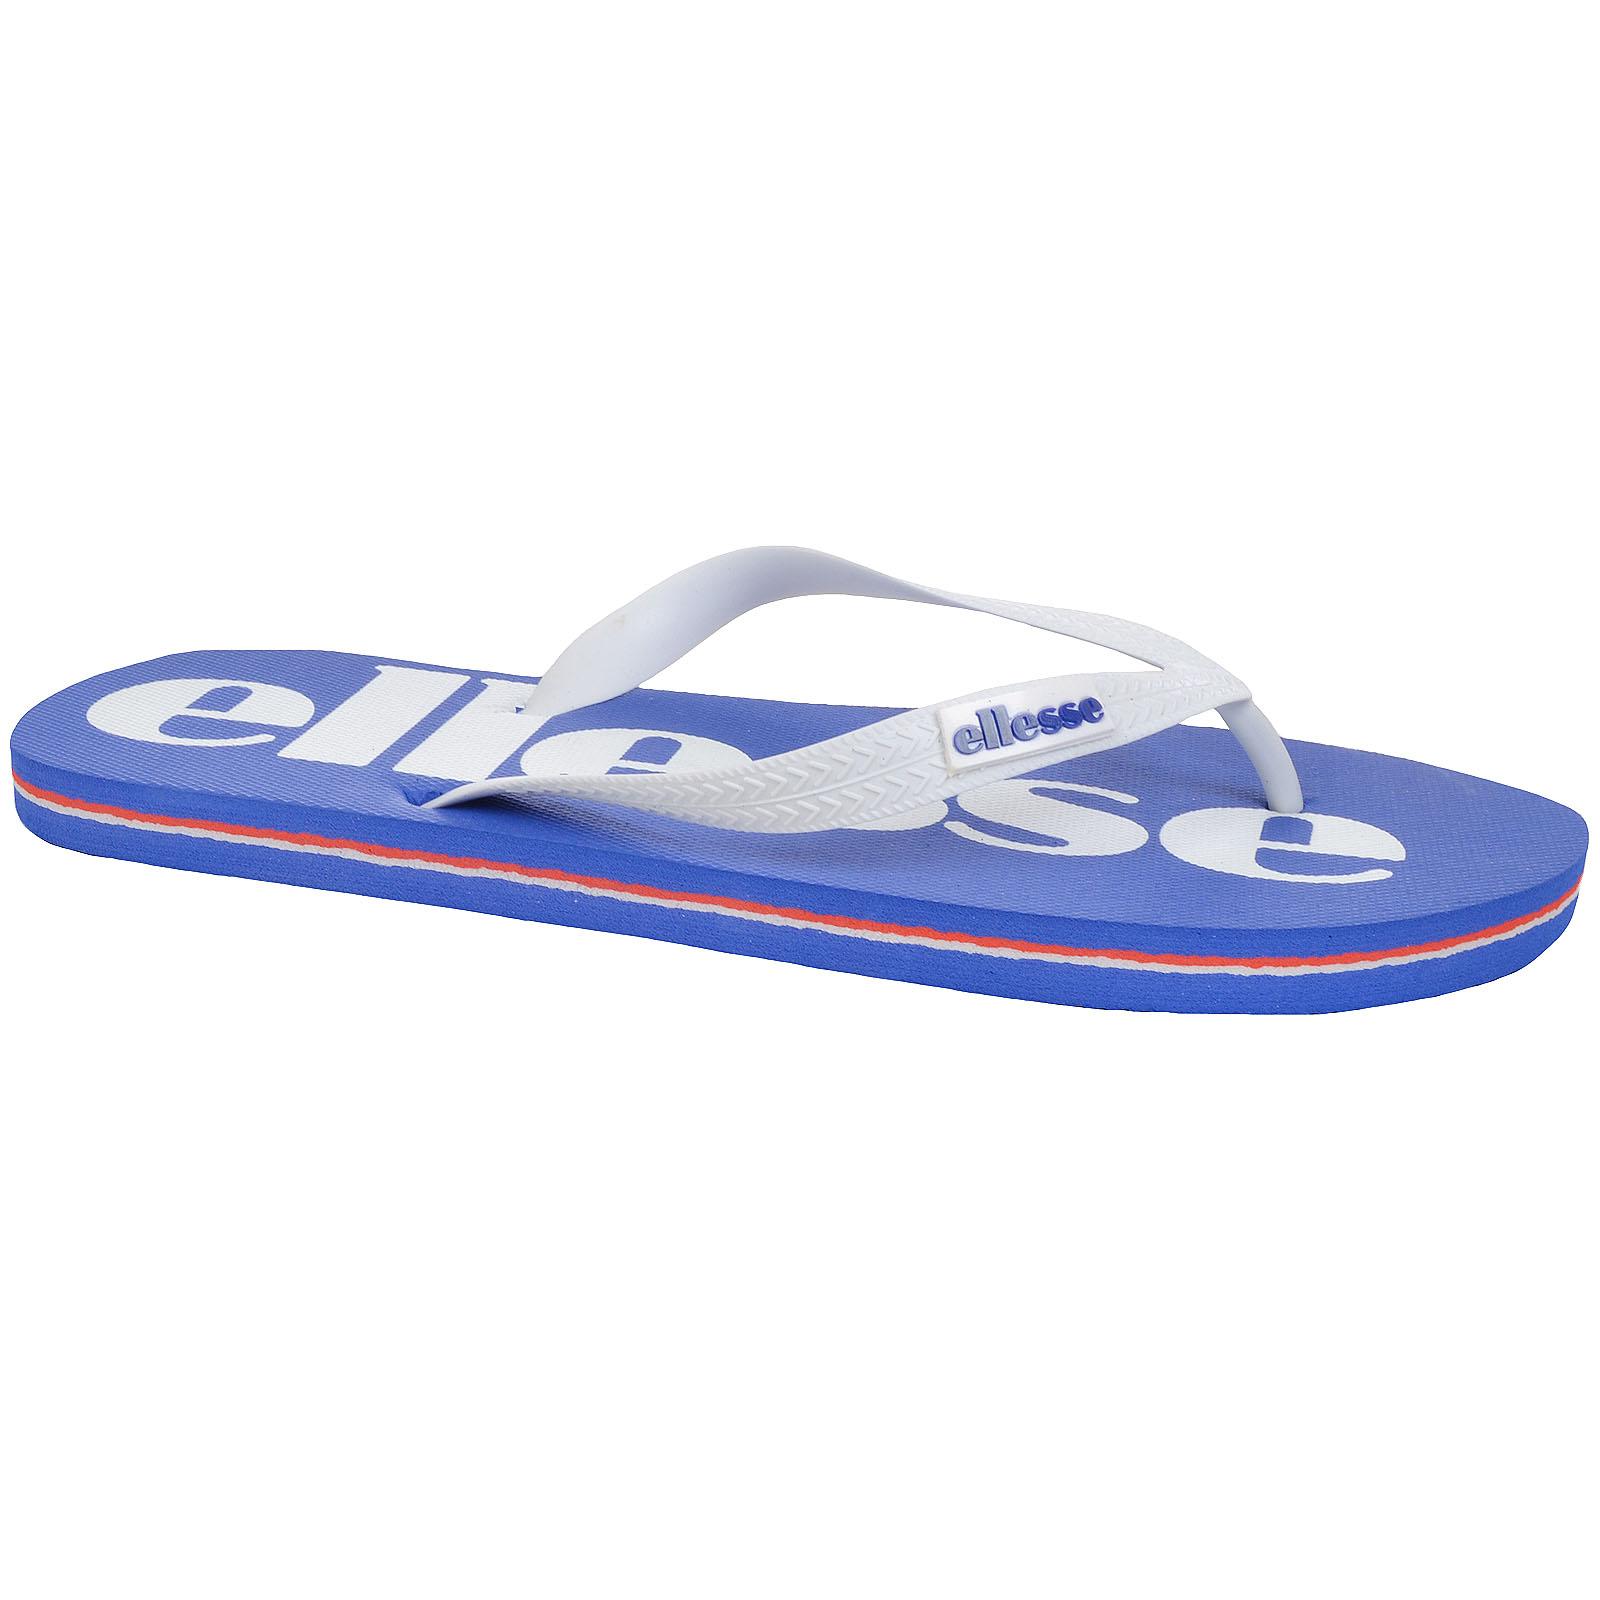 Ellesse-Mens-Marcos-Flip-Flops-Beach-Pool-Holiday-Slip-On-Sandals-Thongs thumbnail 7